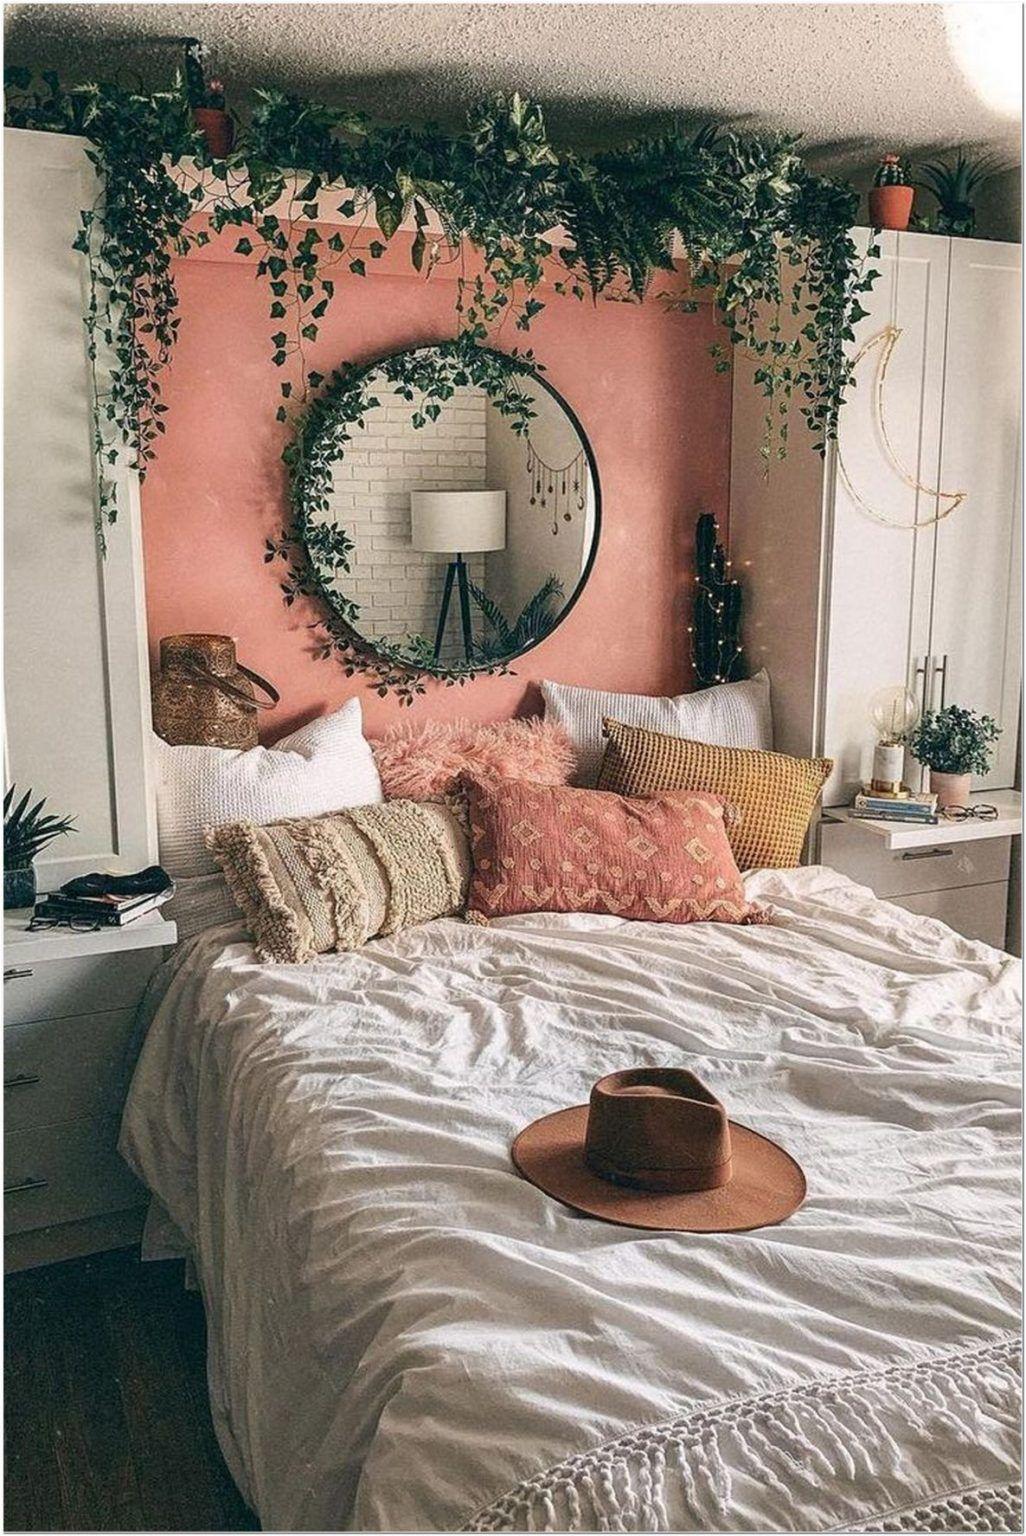 Modern Bohemian Bedroom Decor Ideas Modern Bohemian Bedroom Bedroom Decor Cozy Room